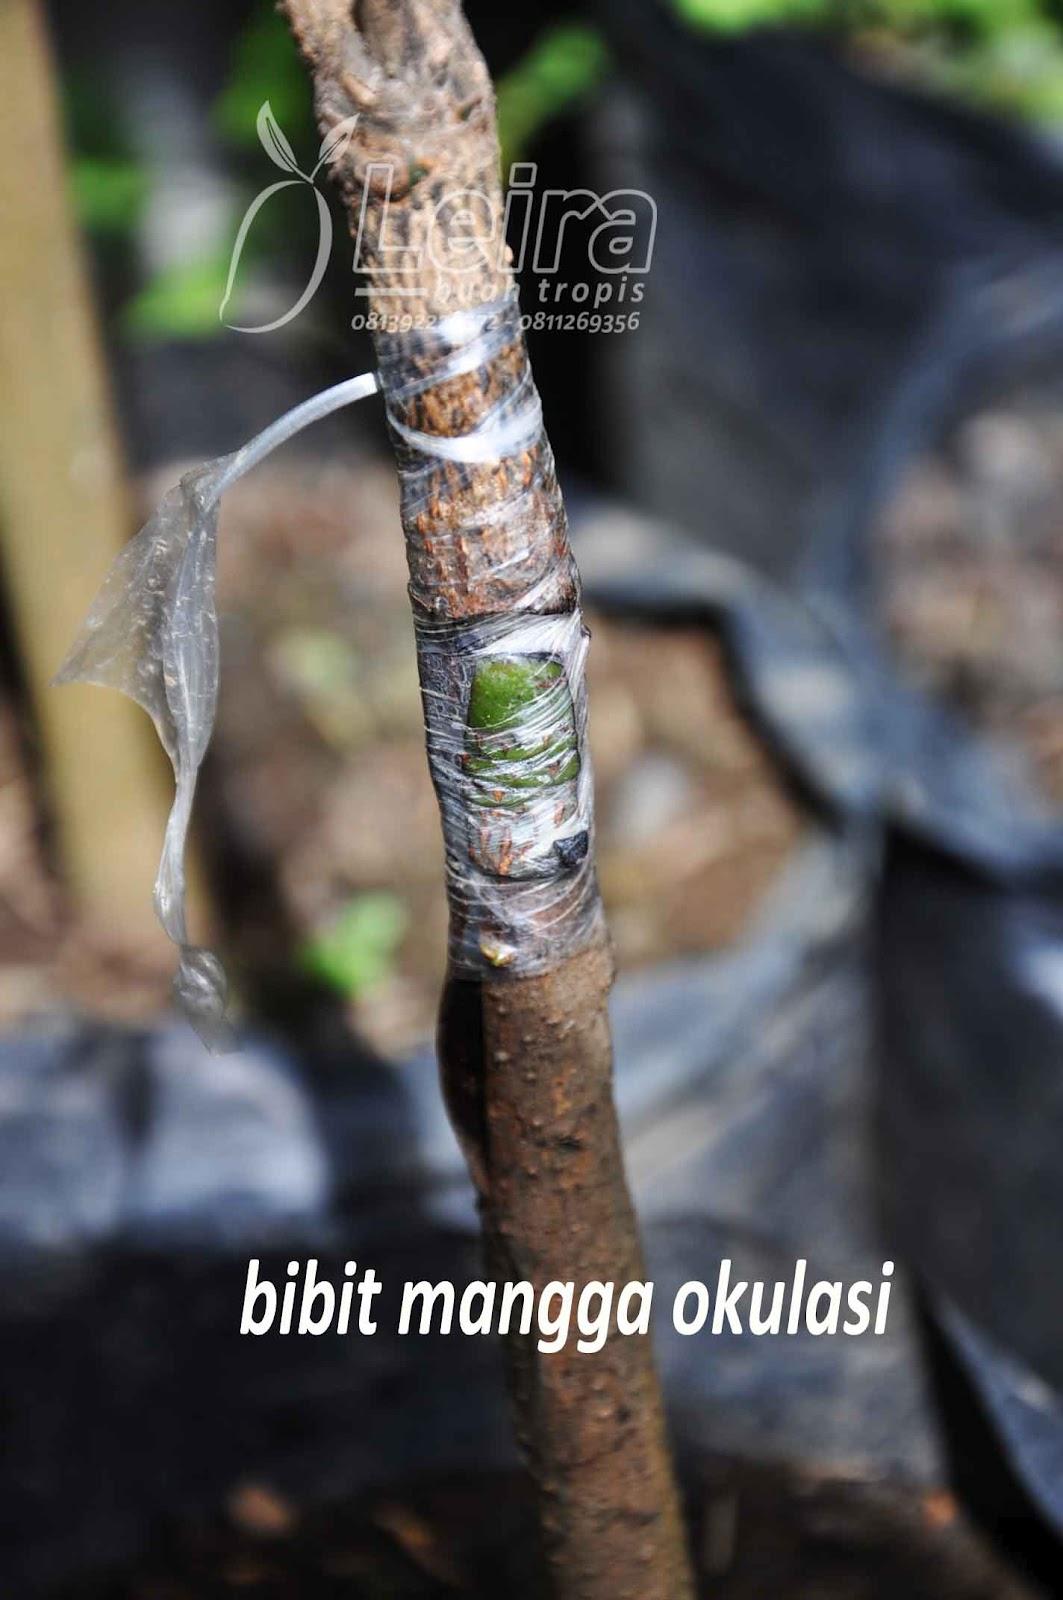 Variasi Bibit Tanaman Buah Mangga ~ Leira Buah Tropis